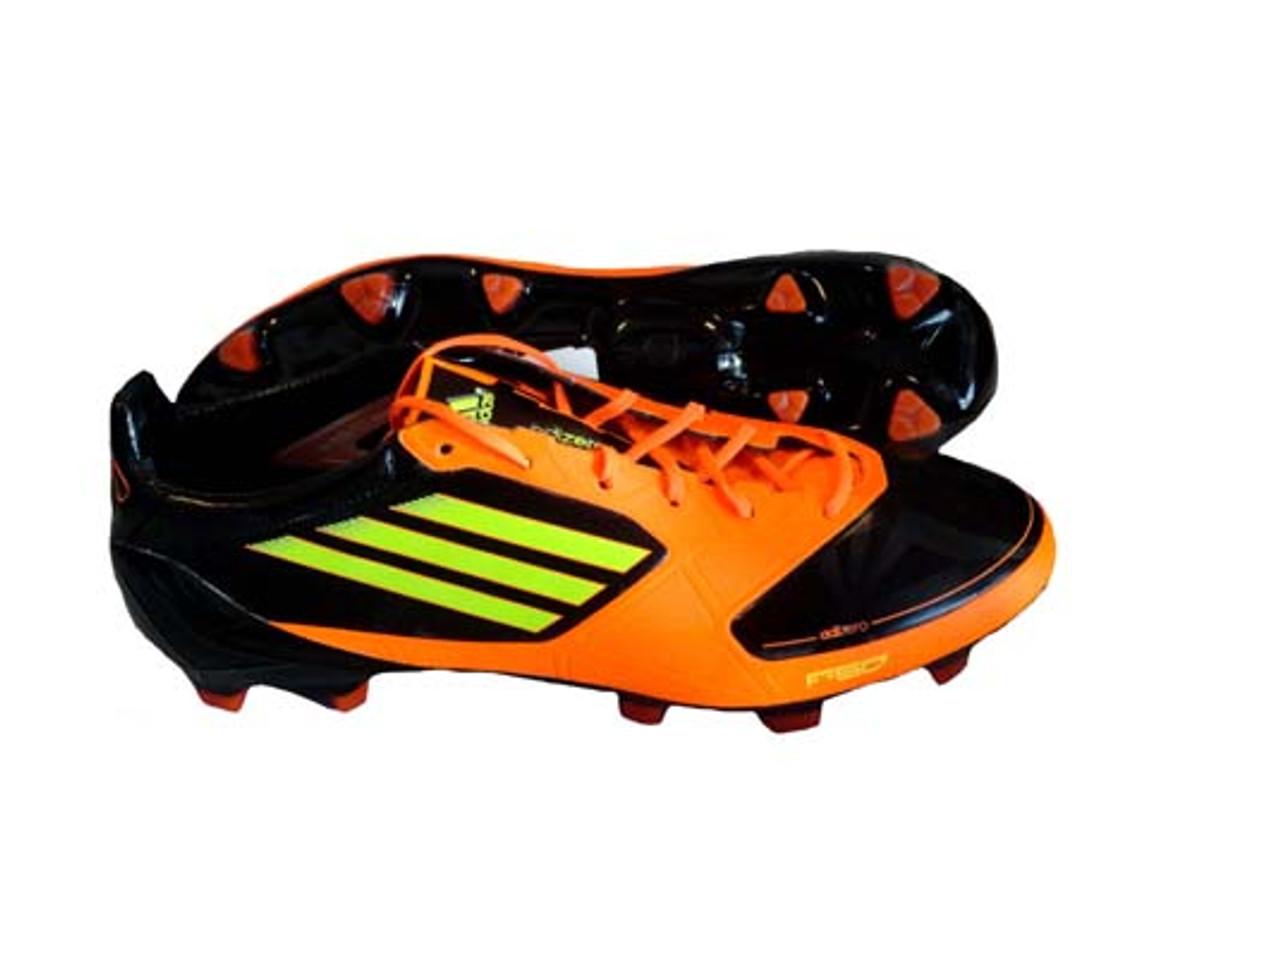 183edb283718 ADIDAS F50 ADIZERO SOCCER CLEATS black/electric/orange - Soccer Plus